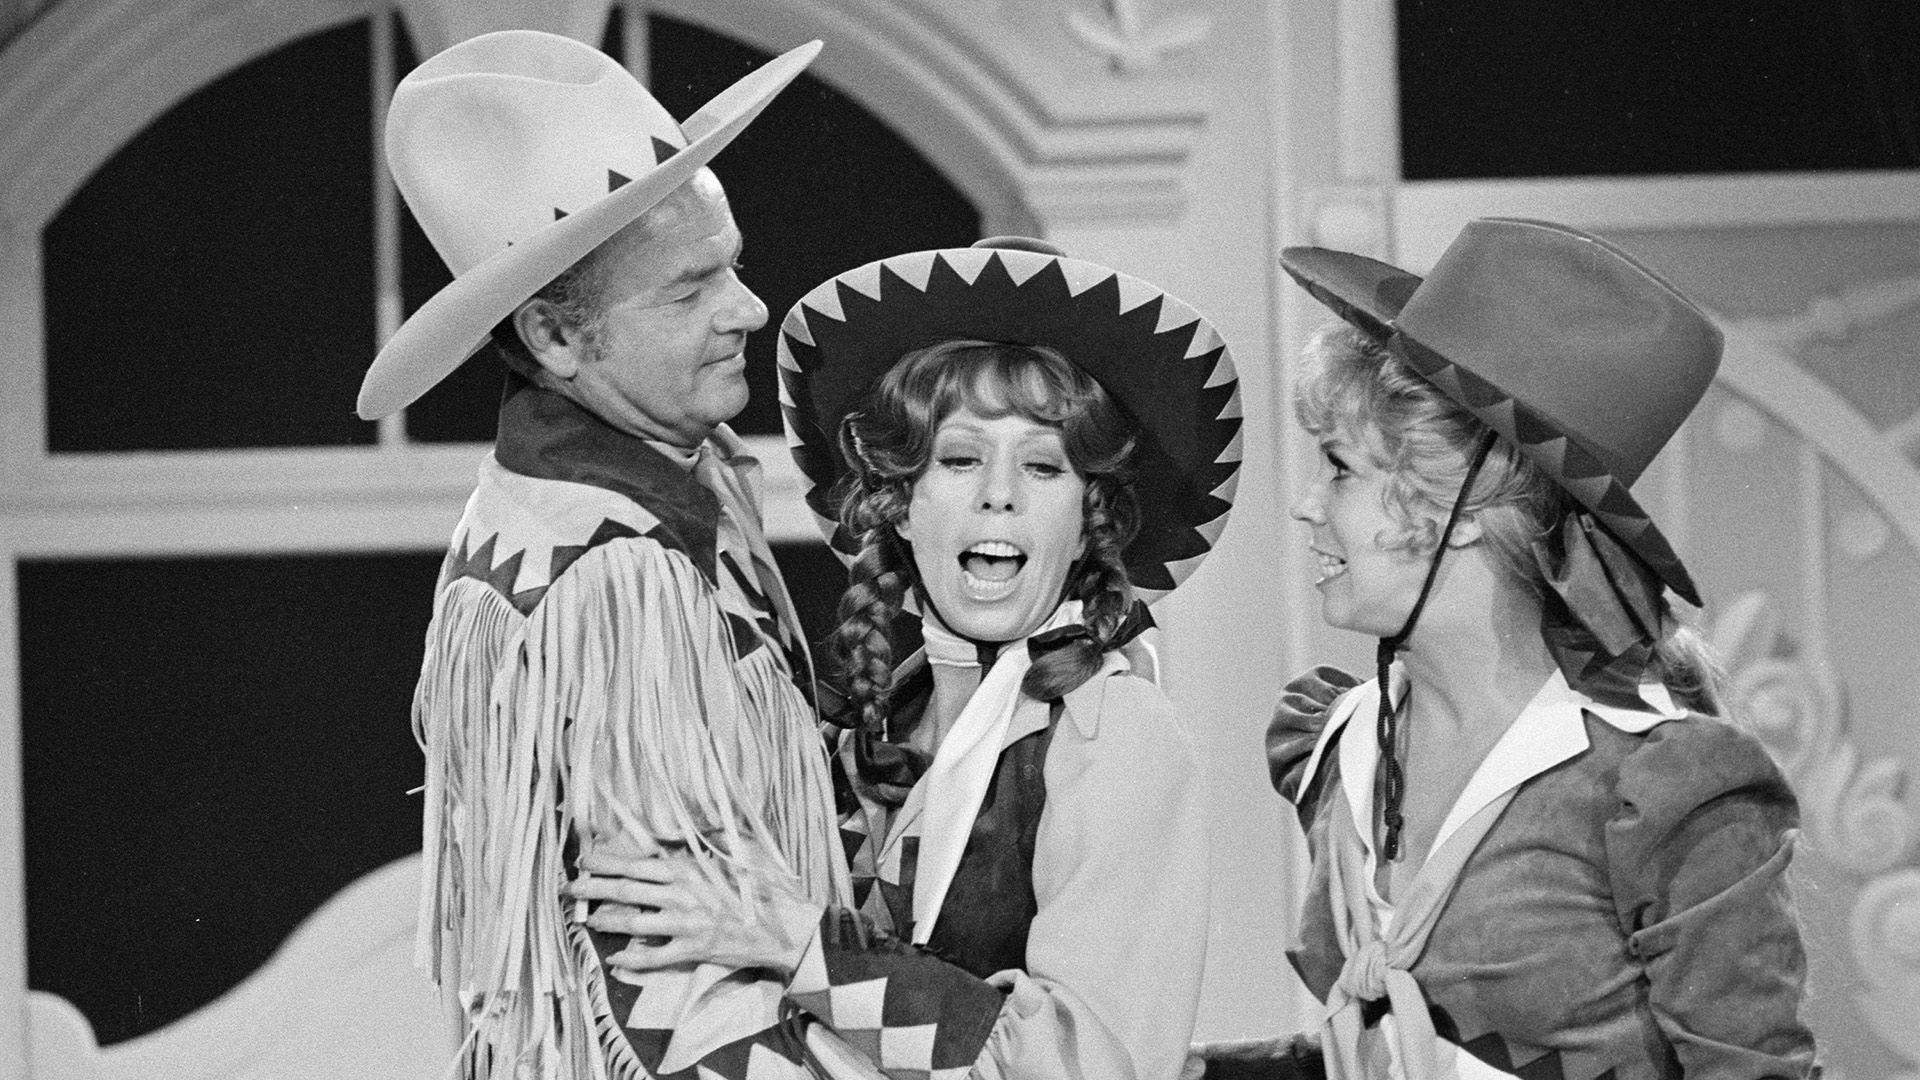 Carol Burnett with co-stars Vicki Lawrence and Harvey Korman.